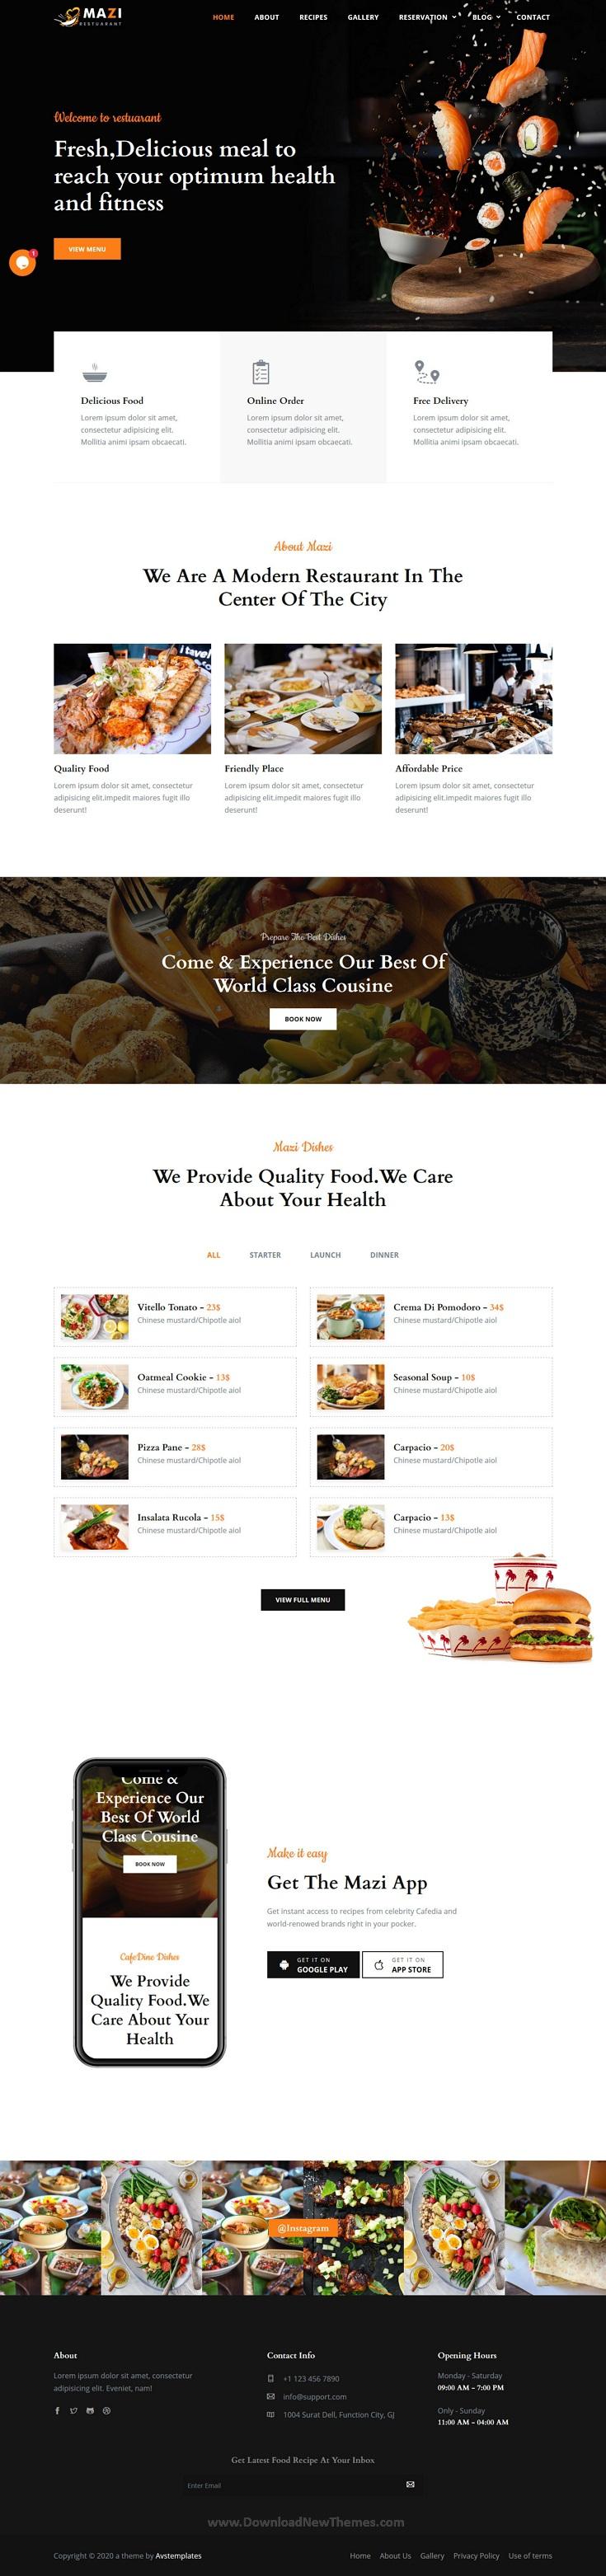 Fast Food & Restaurant Template